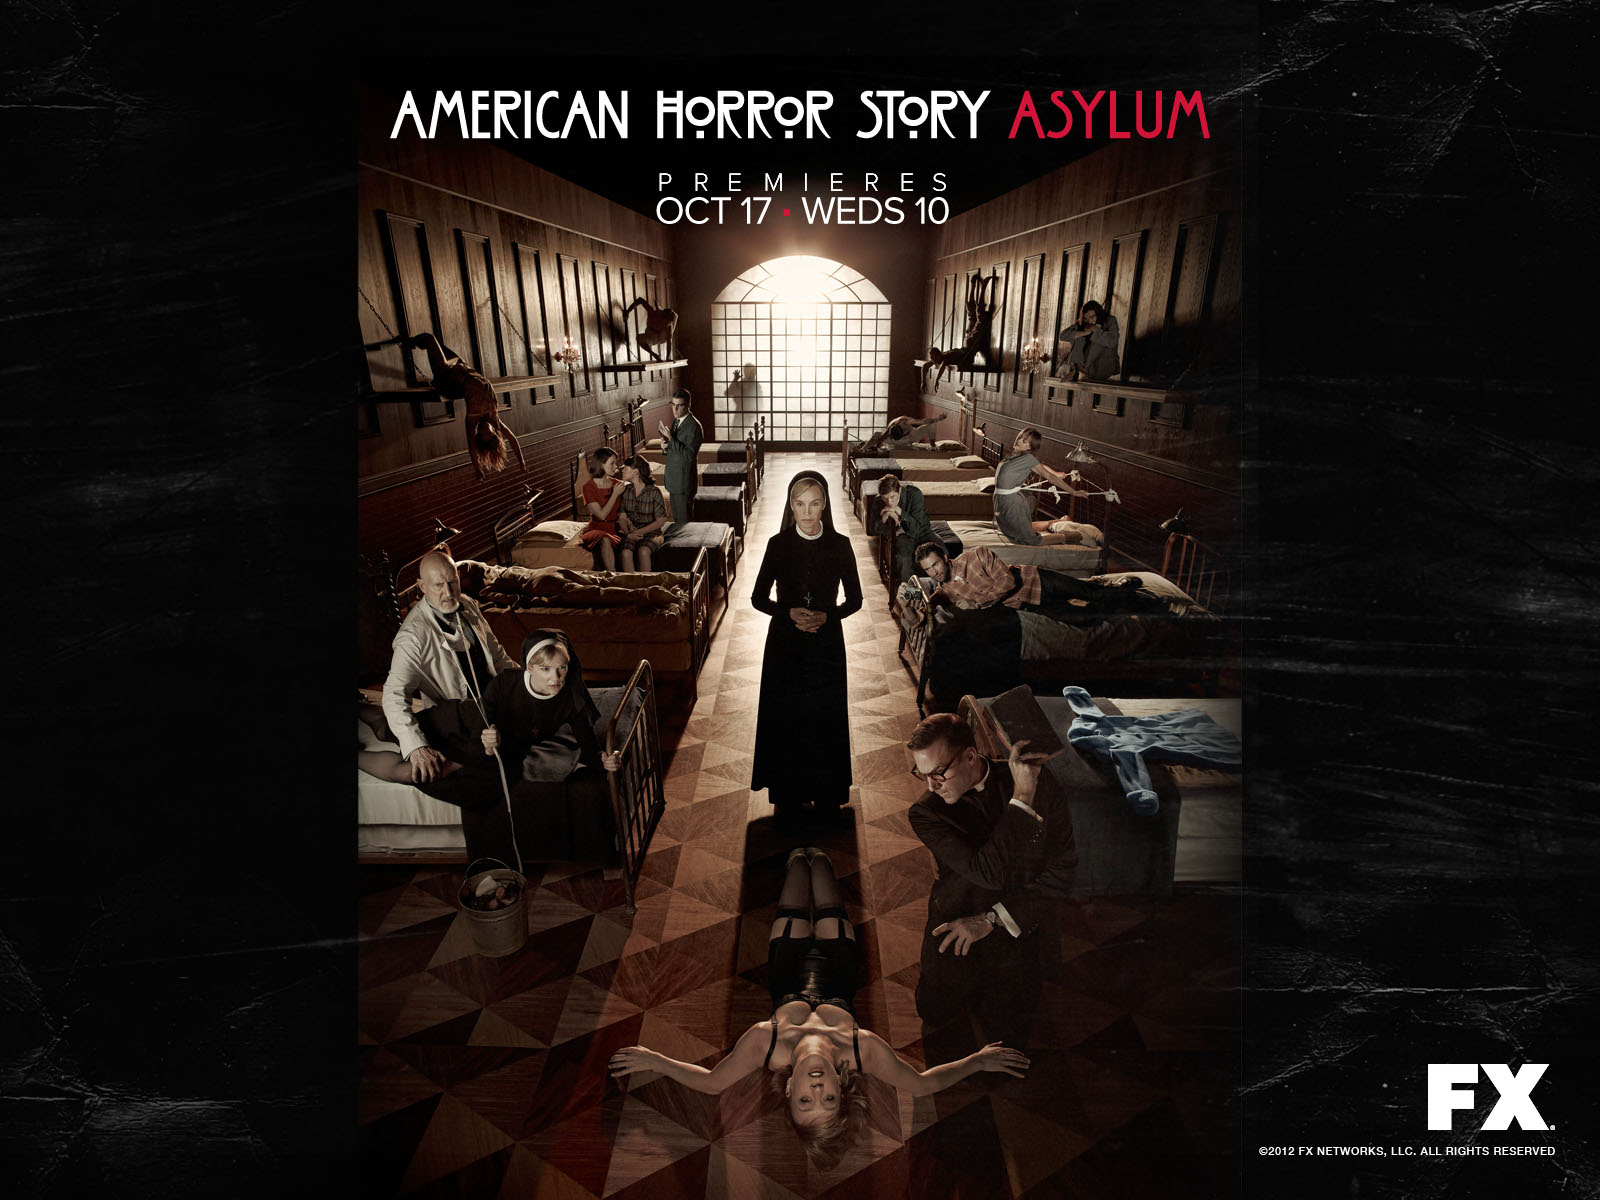 American Horror Story Hd Wallpaper: Wallpapers : American Horror Story Asylum